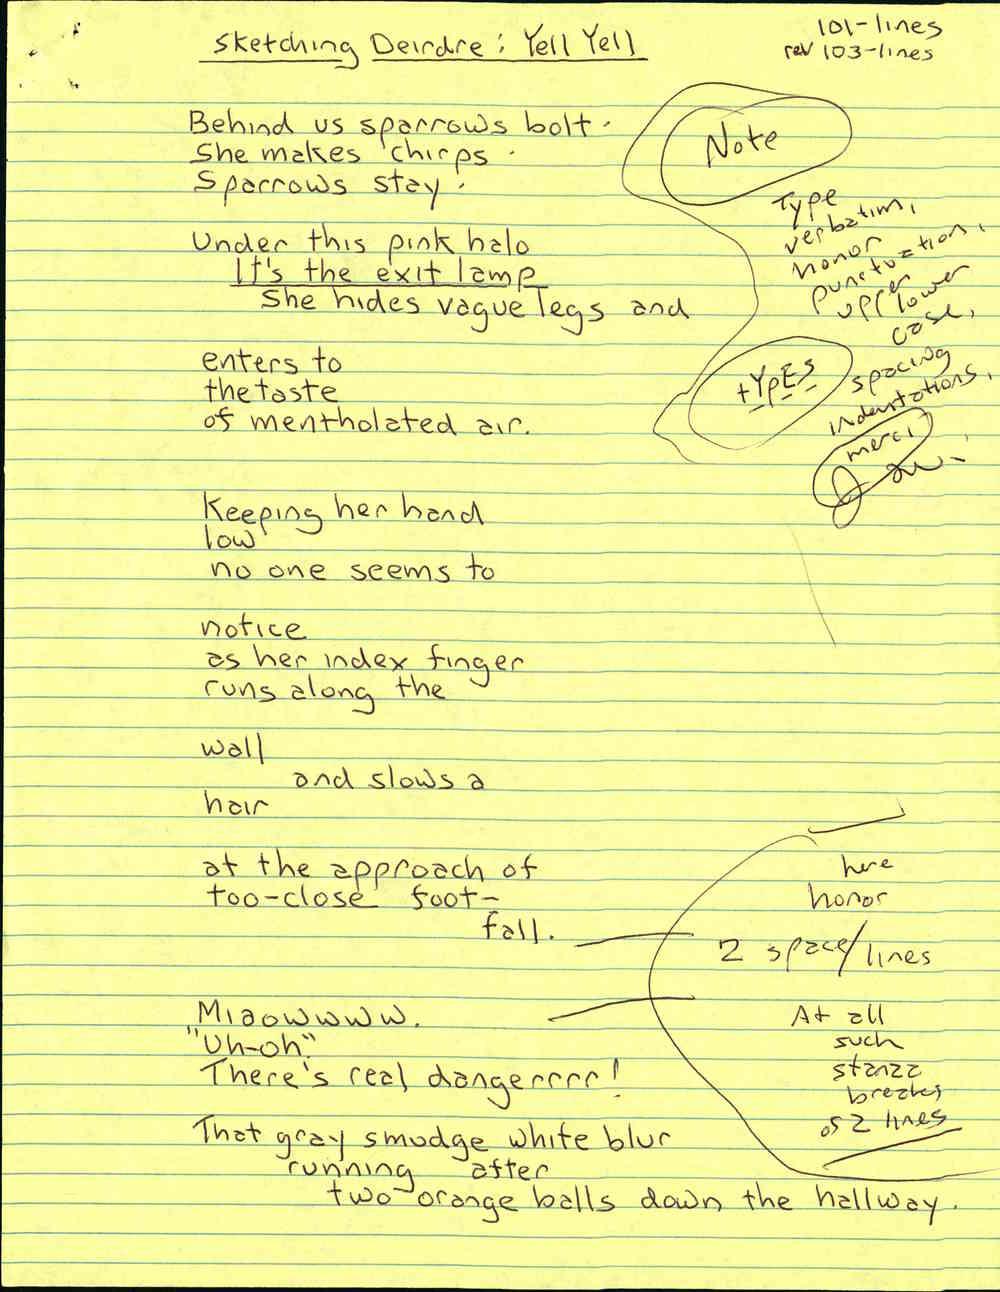 Jim G Wee - Sketching Deirdre Yell Yell (1).jpg